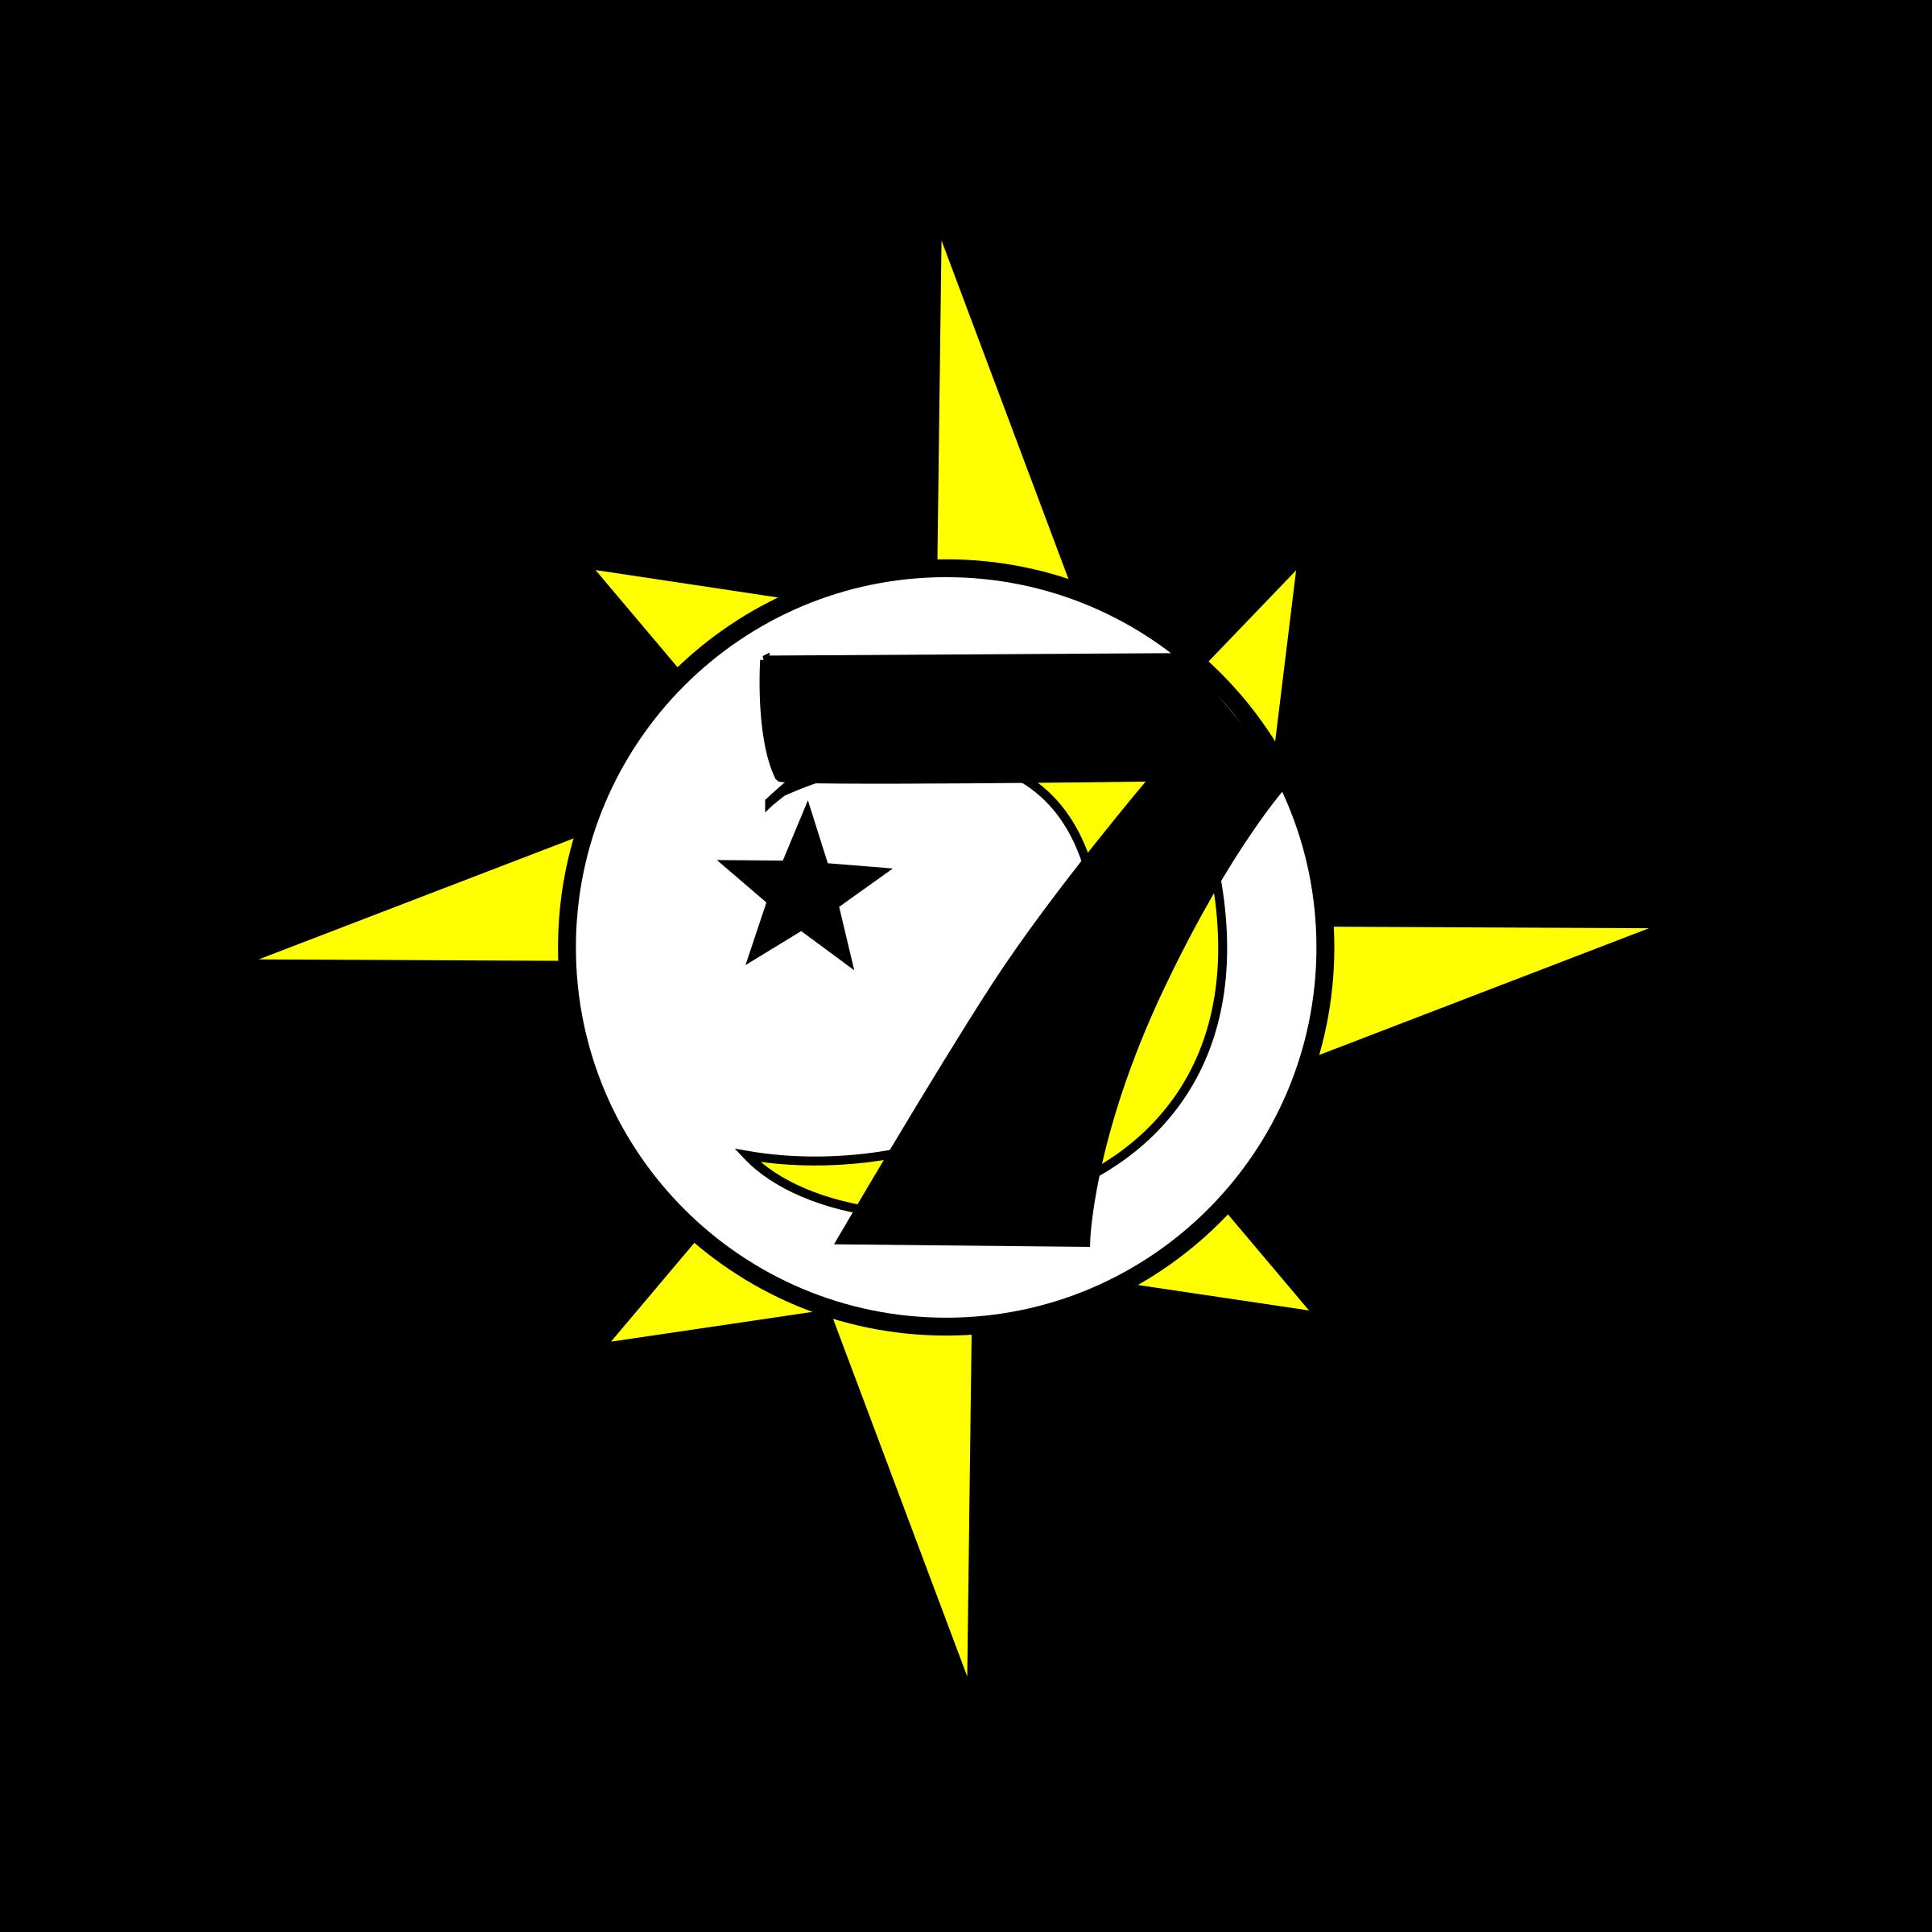 God clipart logo. Nation of gods and